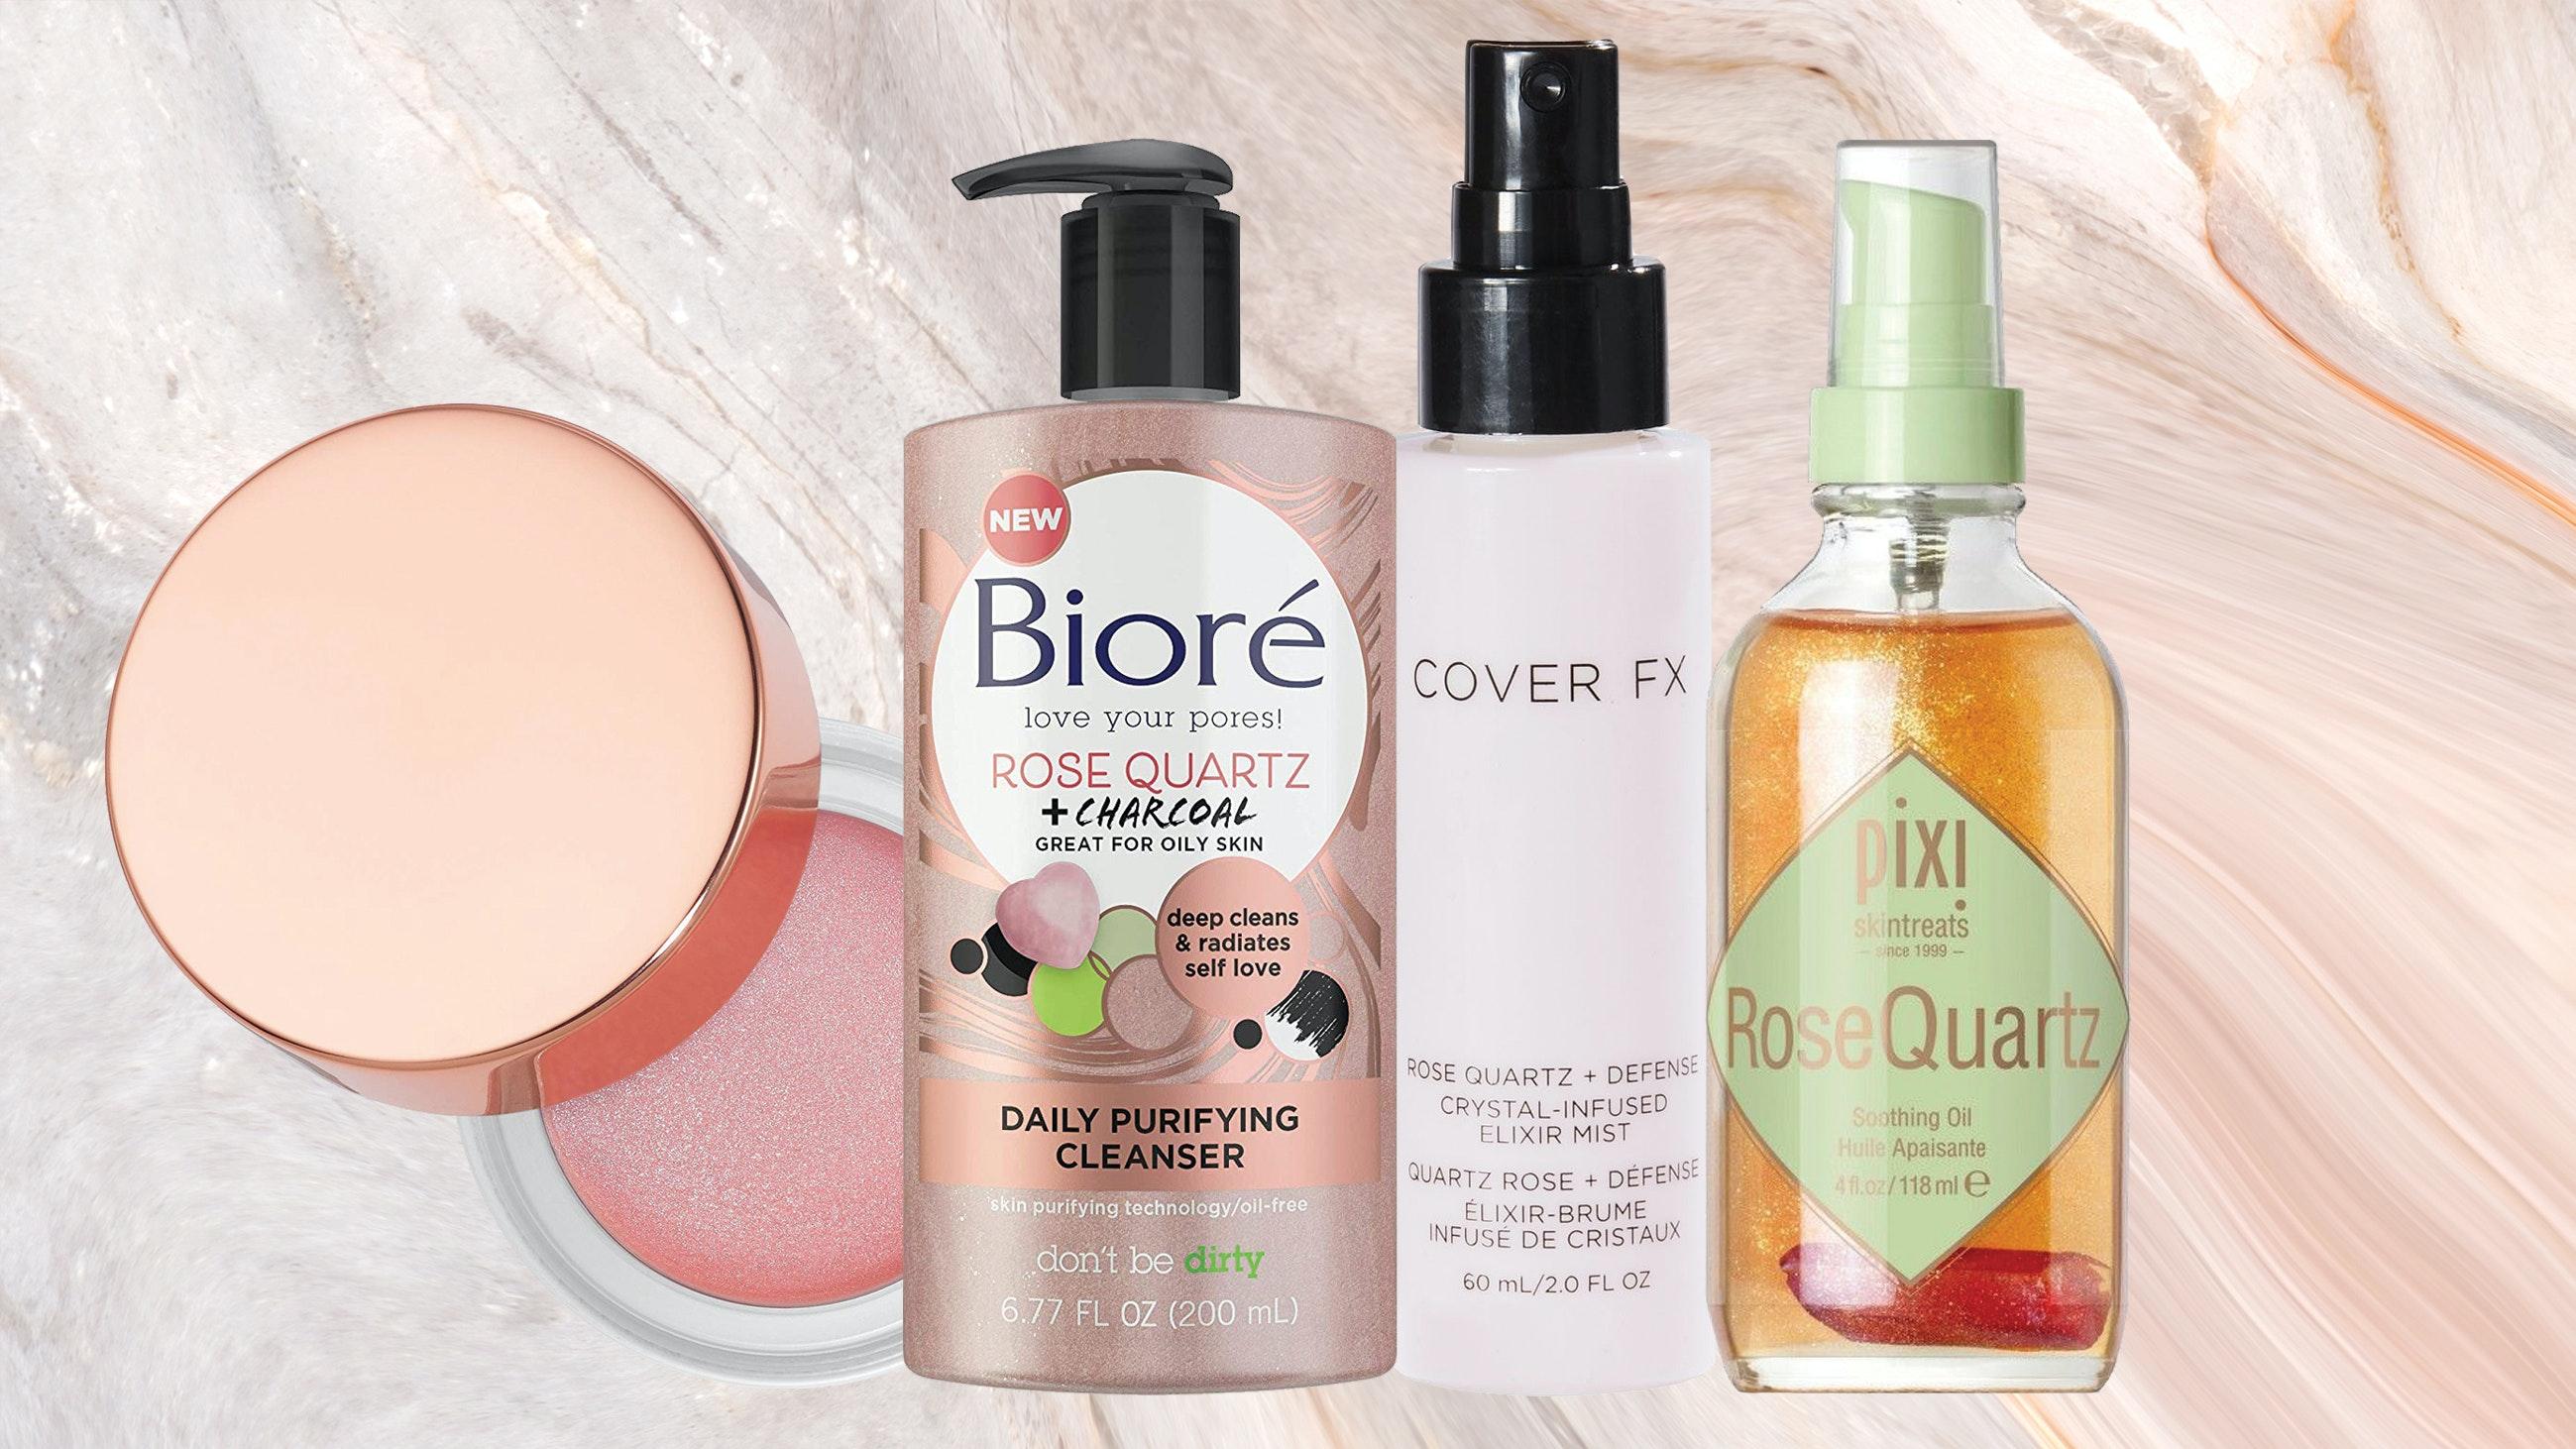 Rose quartz beauty products